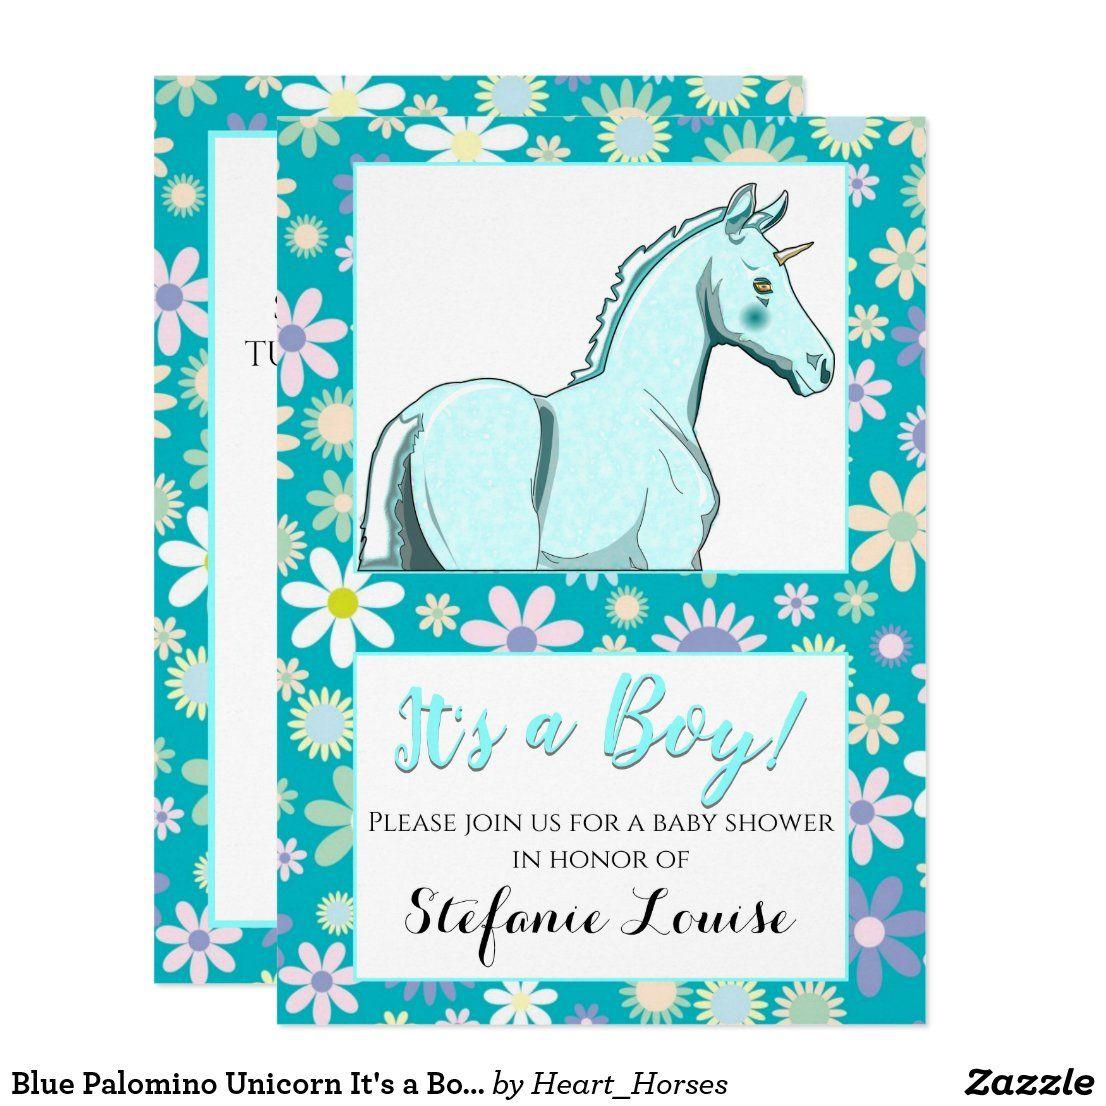 Blue Palomino Unicorn It's a Boy! (blue flowers